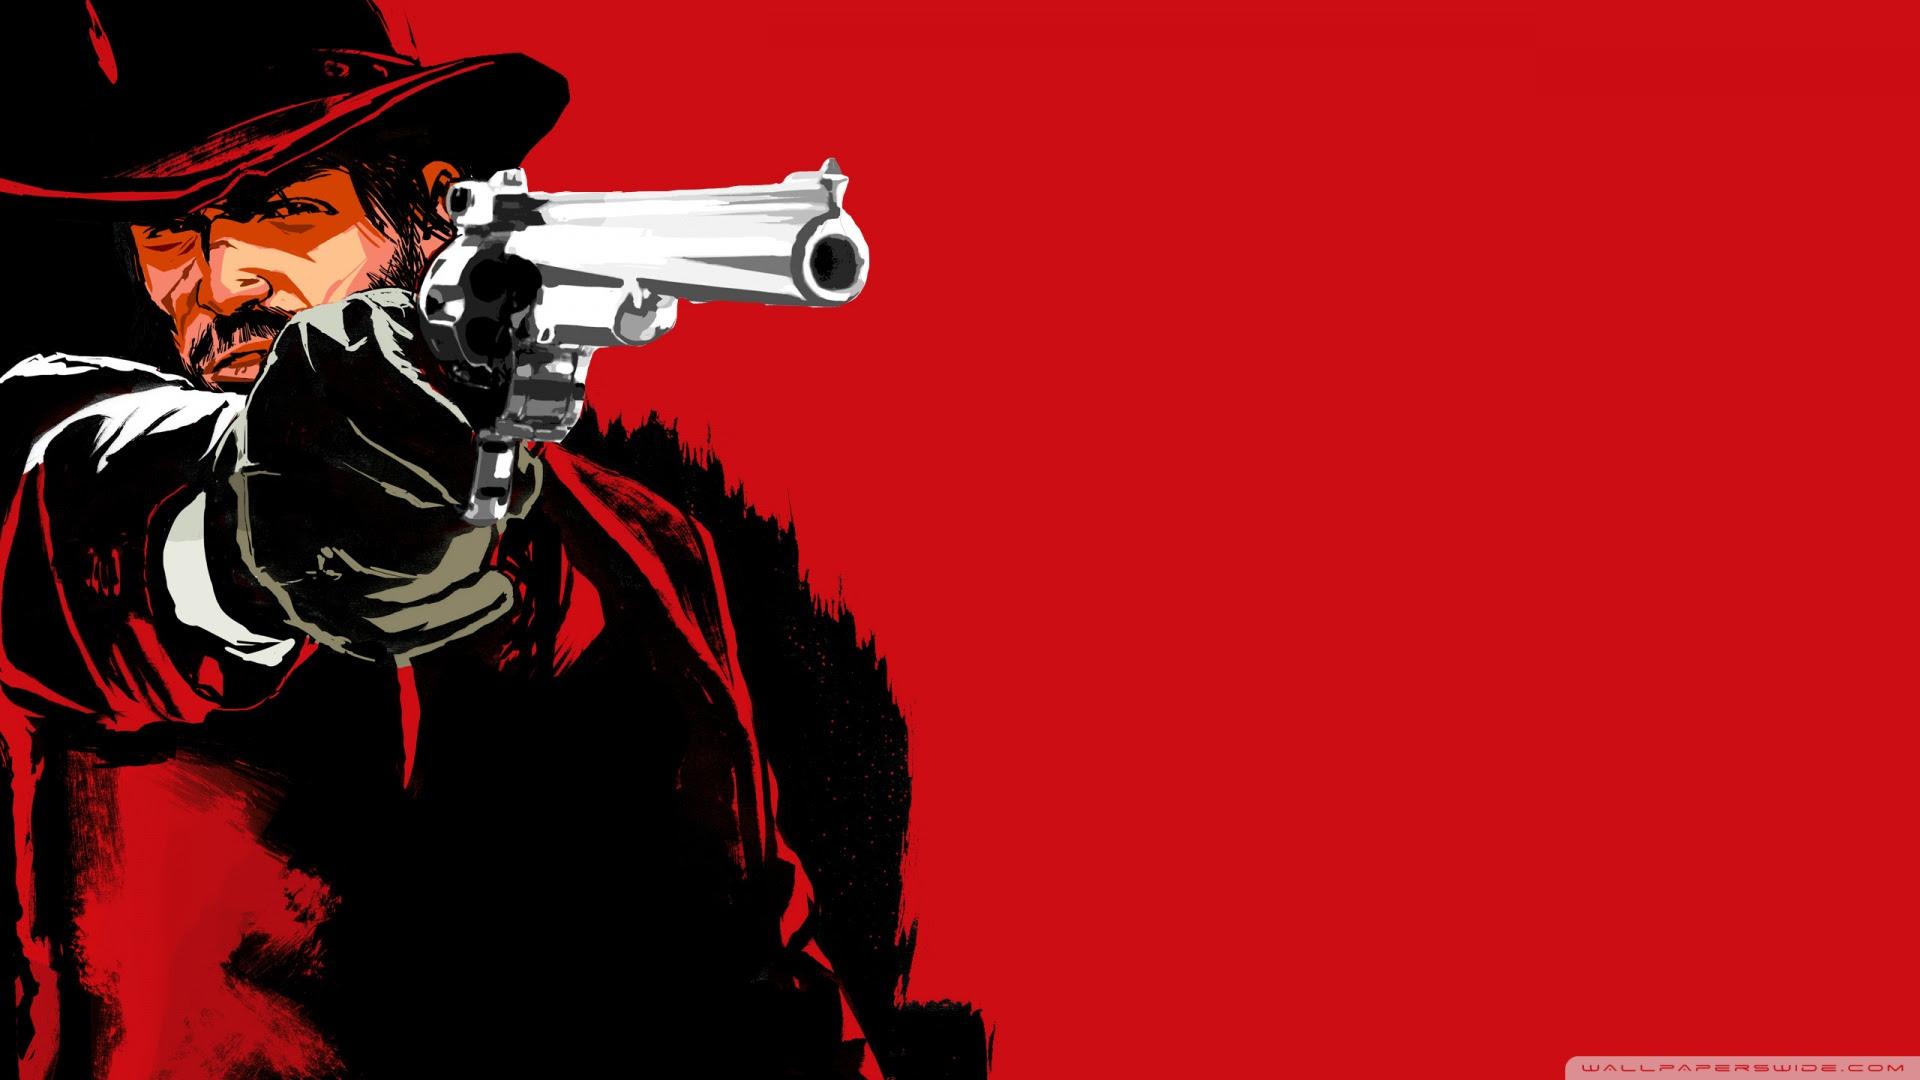 Red Dead Redemption Marston Ultra Hd Desktop Background Wallpaper